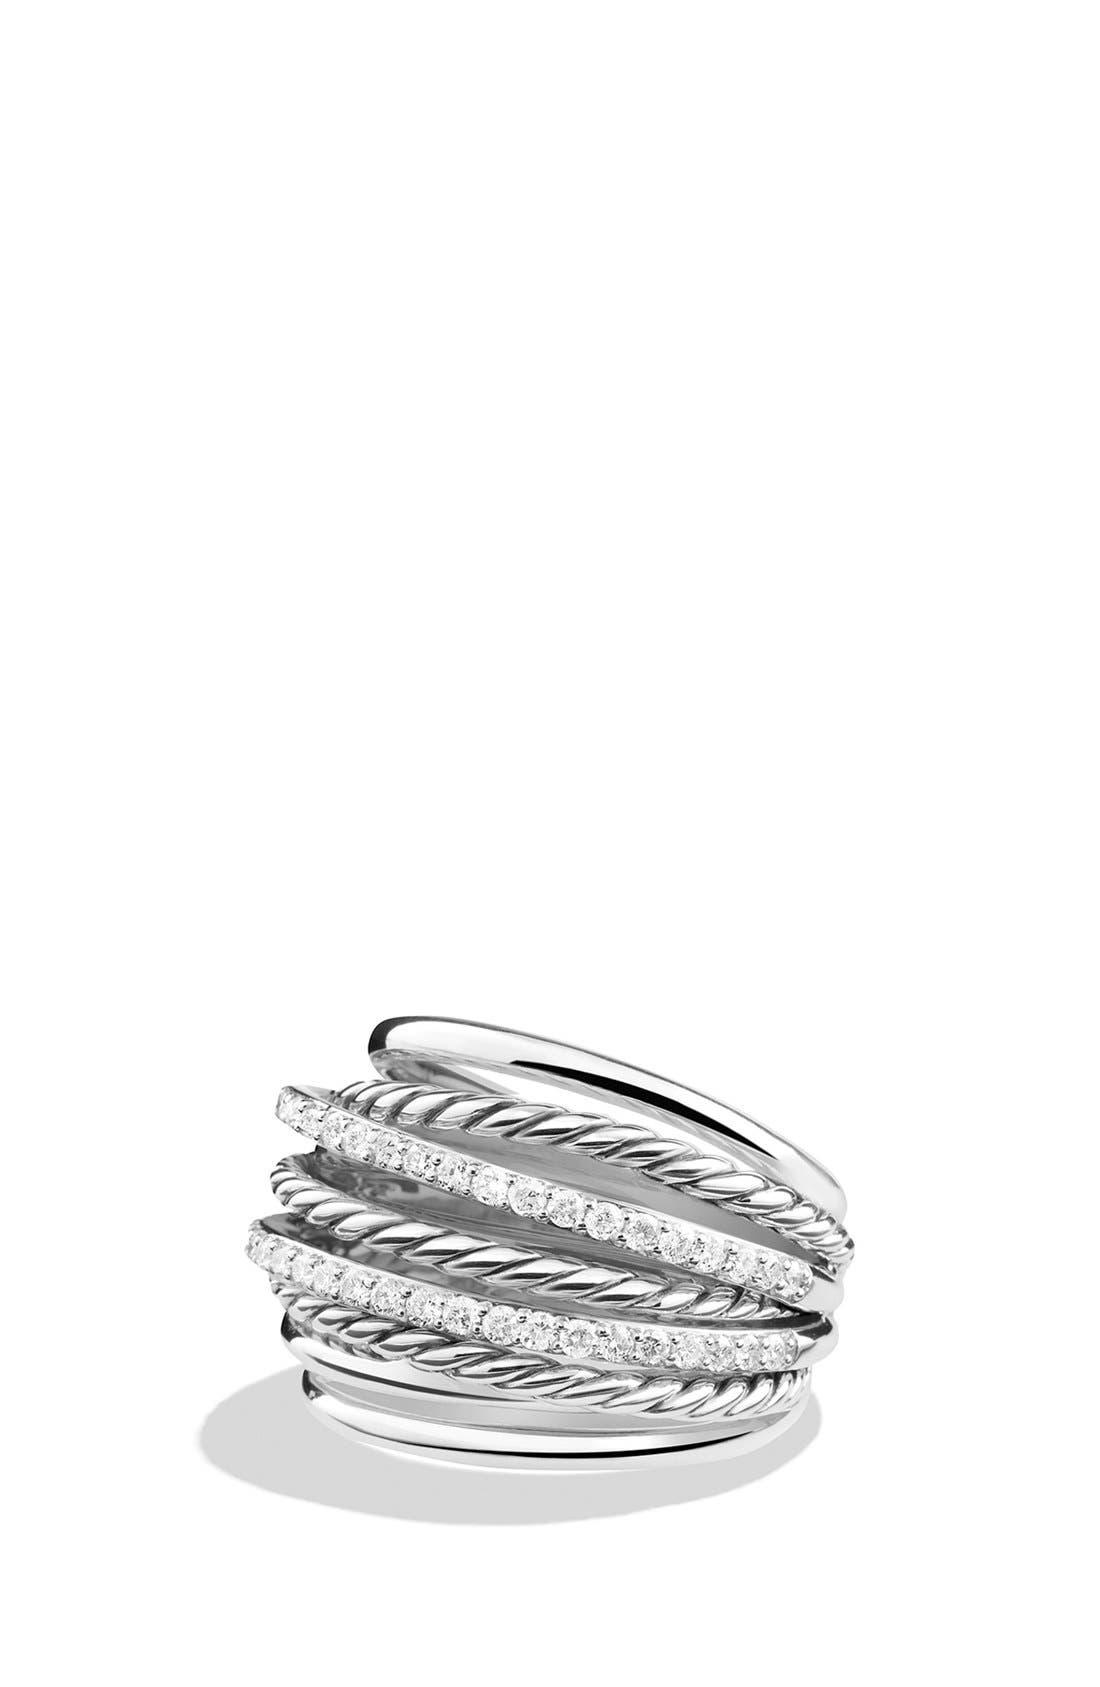 Main Image - David Yurman 'Crossover' Dome Ring with Diamonds